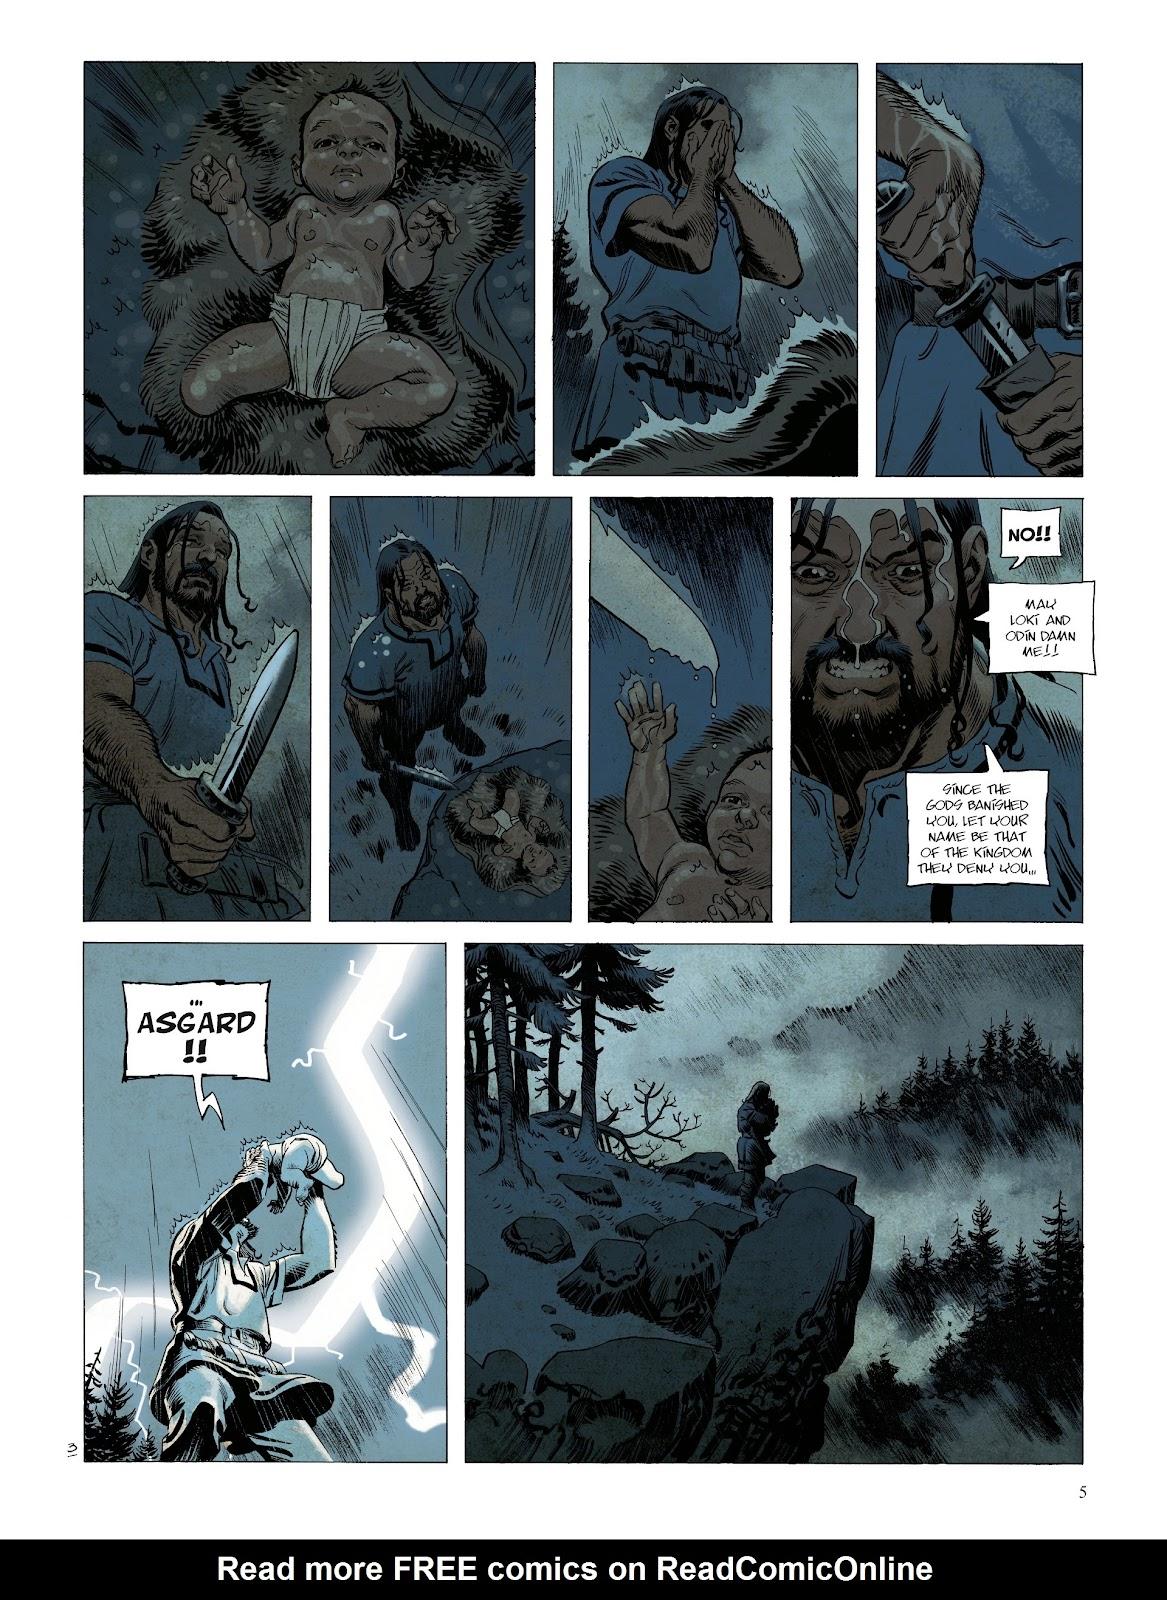 Read online Asgard comic -  Issue #1 - 7